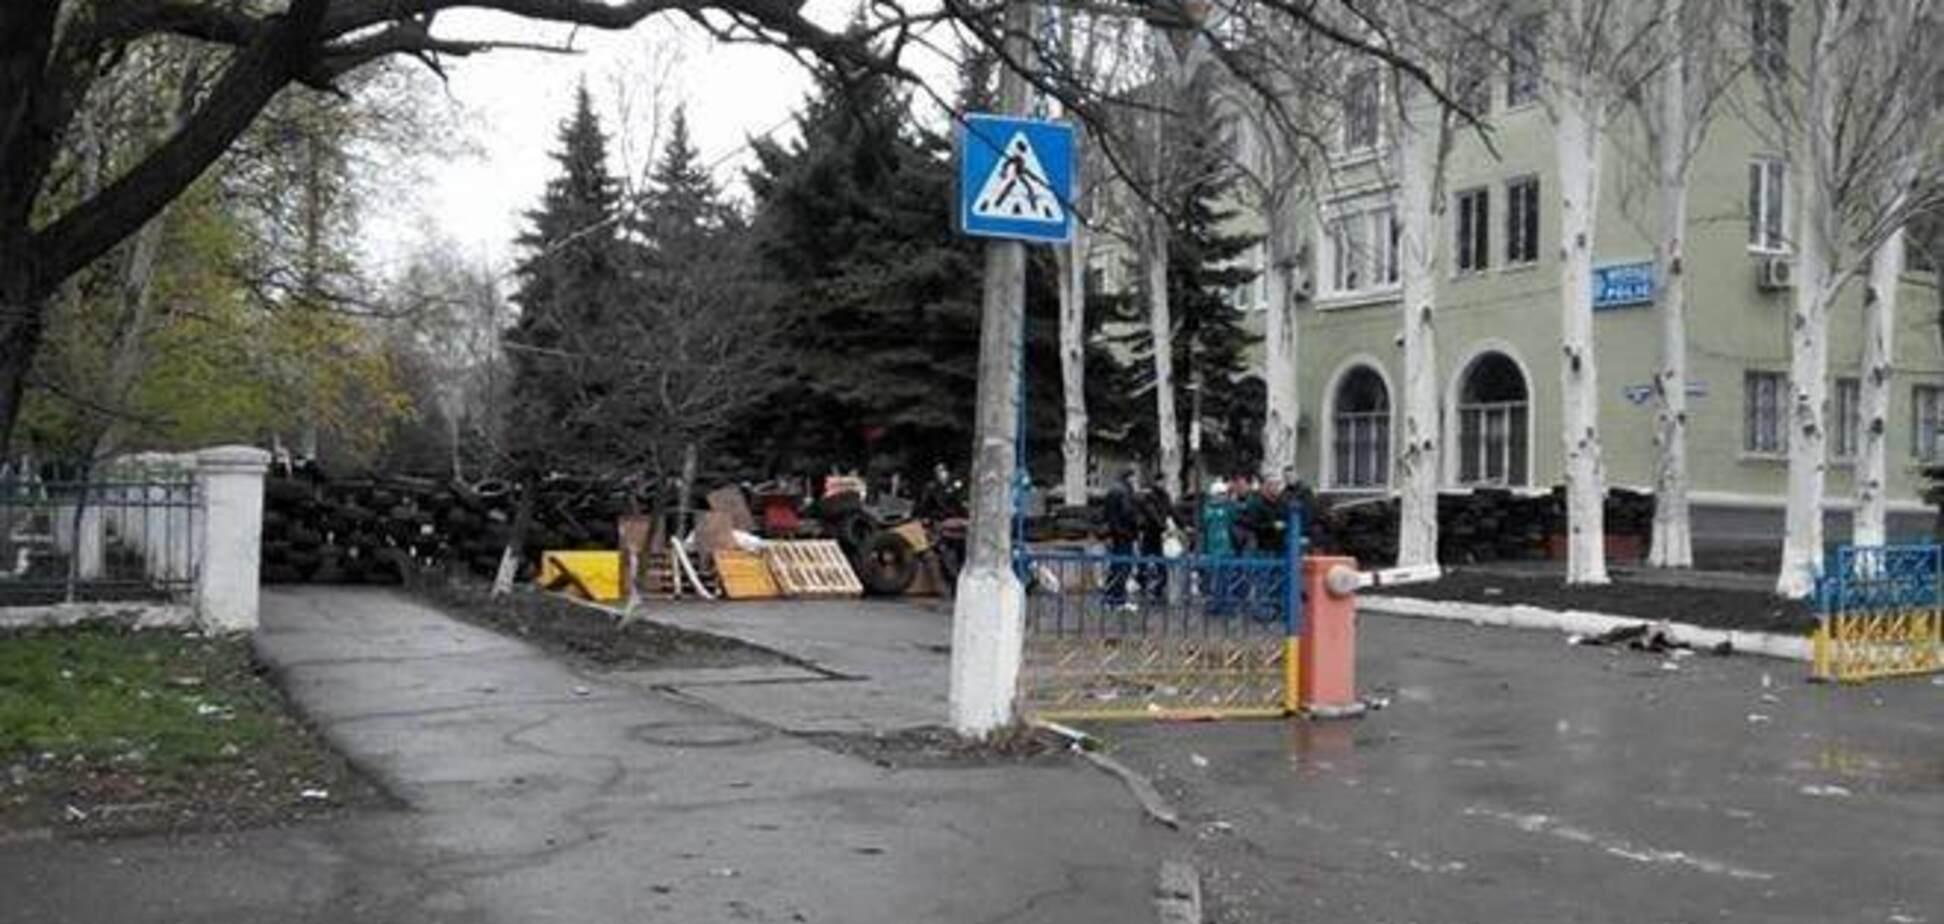 Сепаратисты установили блок-пост около военного аэродрома в Краматорске